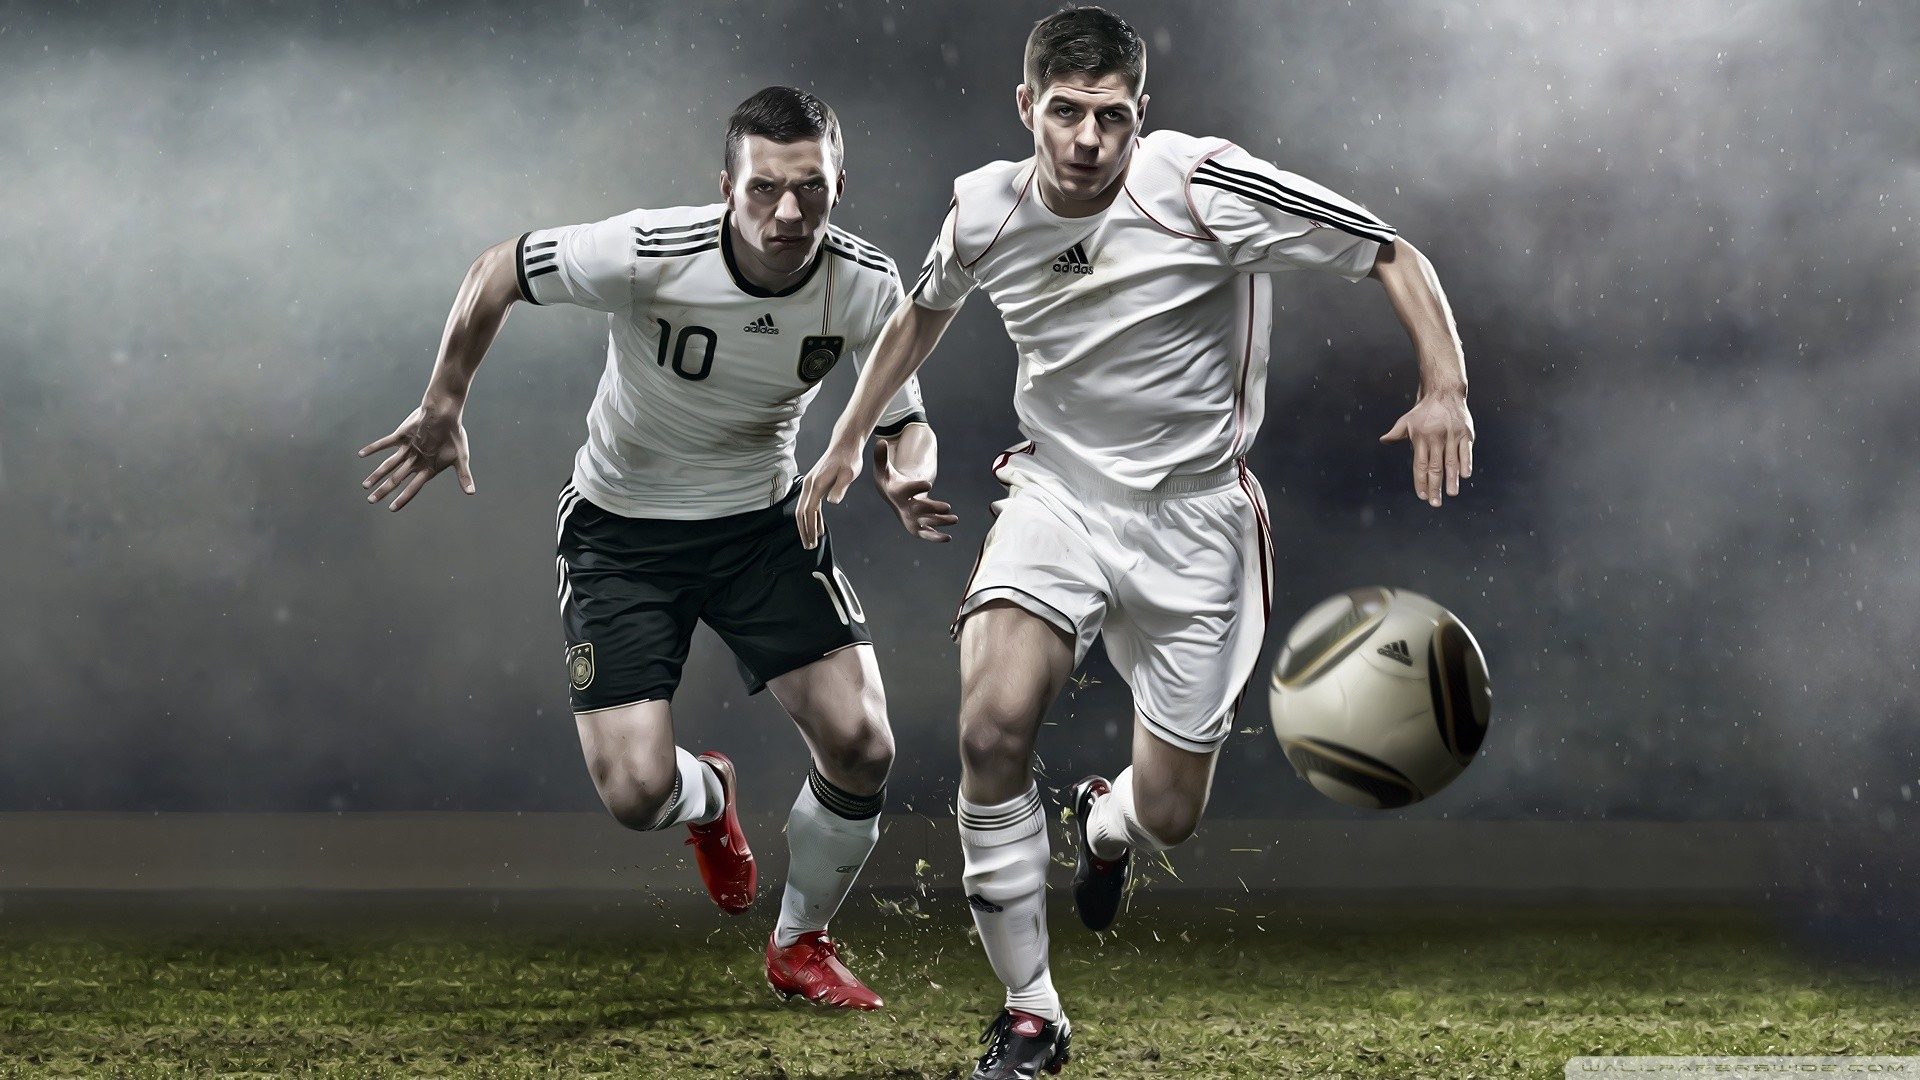 Football HD Wallpapers Free Wallpaper Downloads Football HD